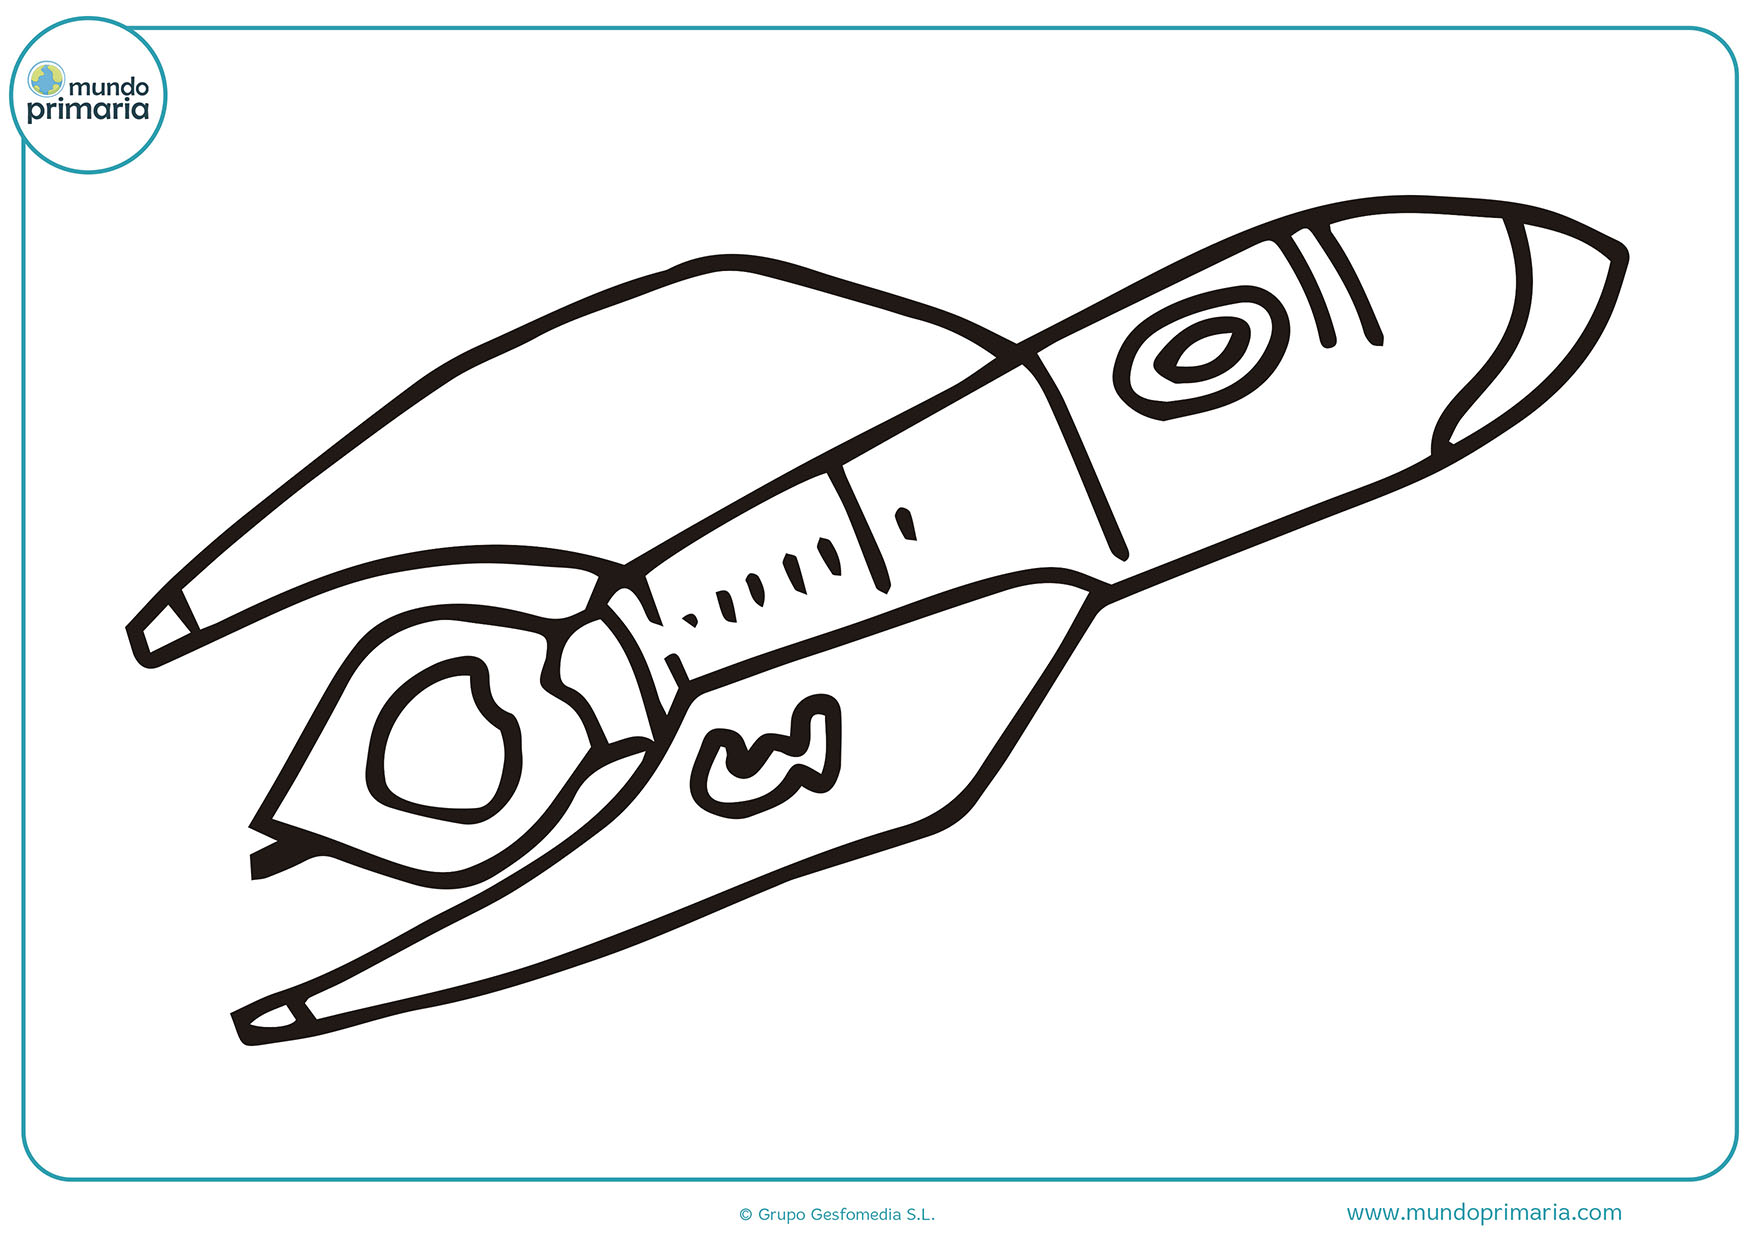 Dibujos de cohetes para colorear - Mundo Primaria